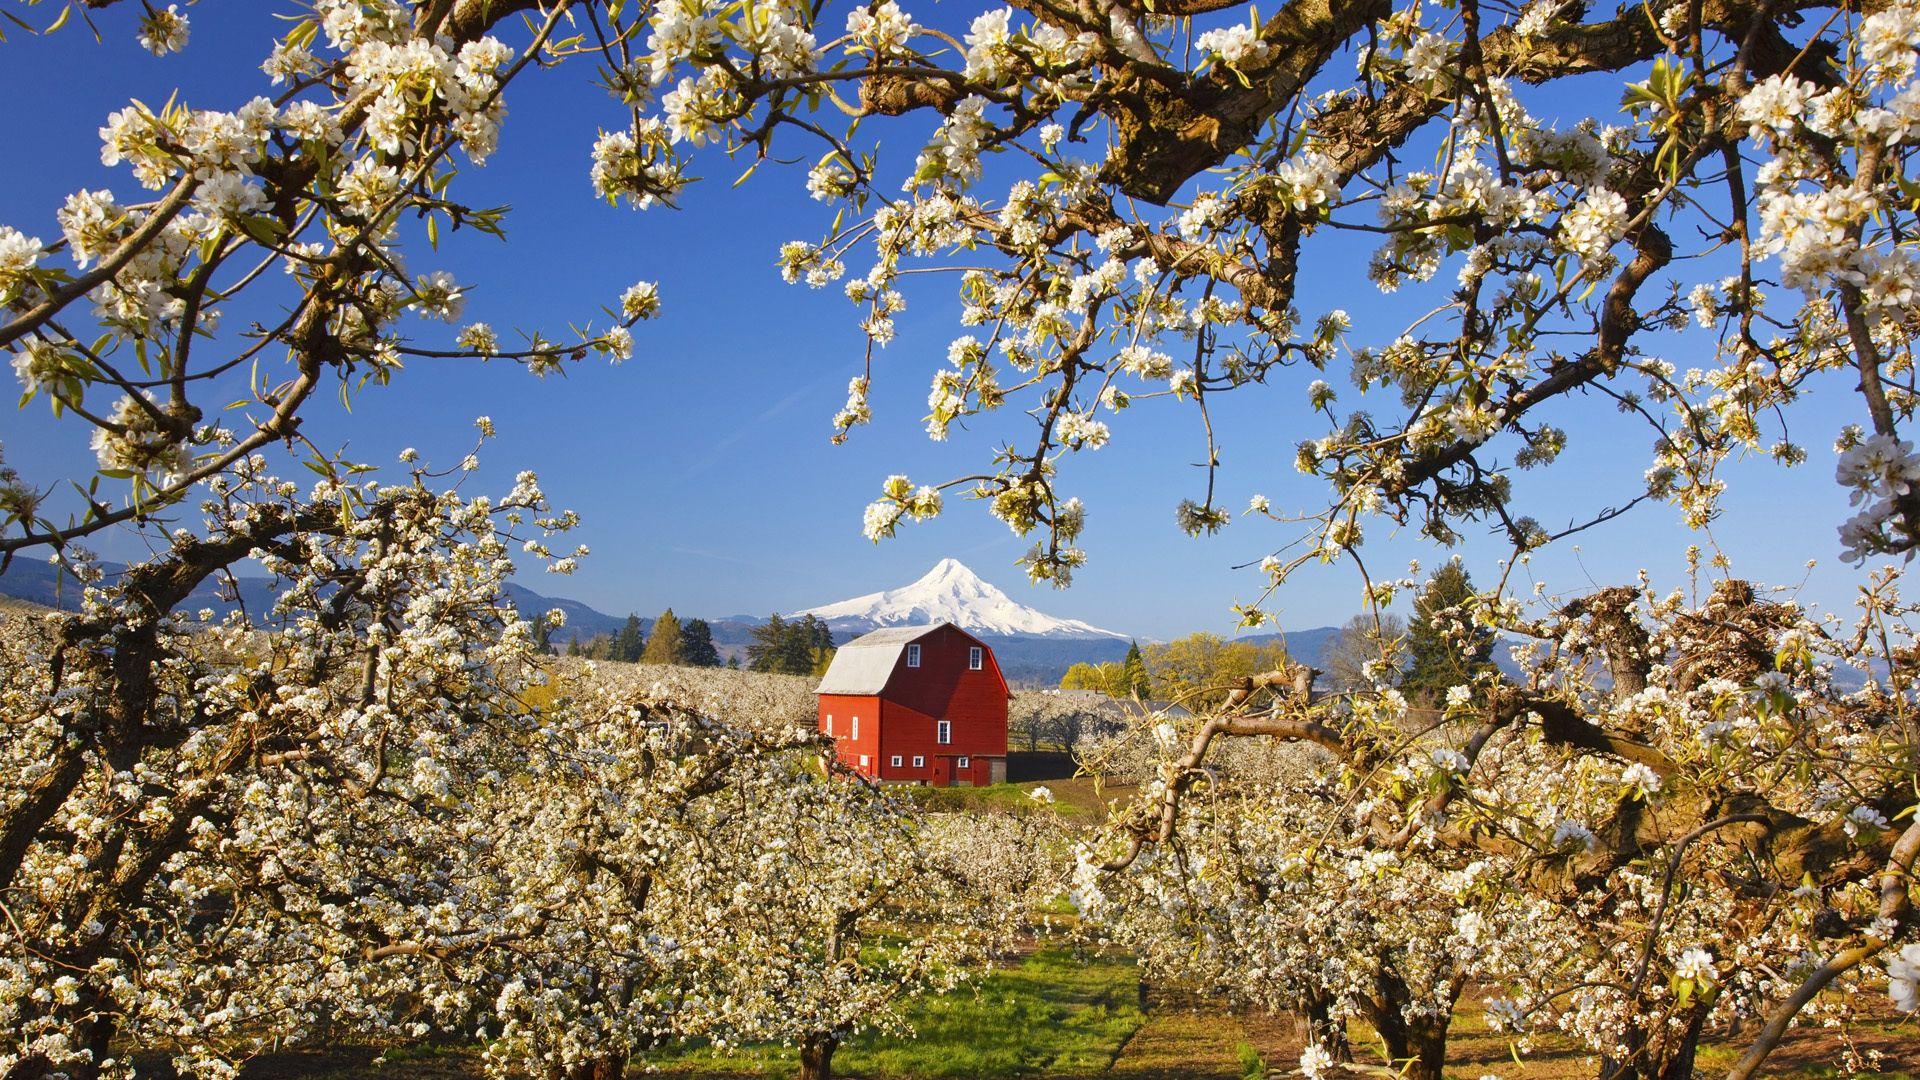 manzana, jardín, montaña, primavera, casa, paisaje